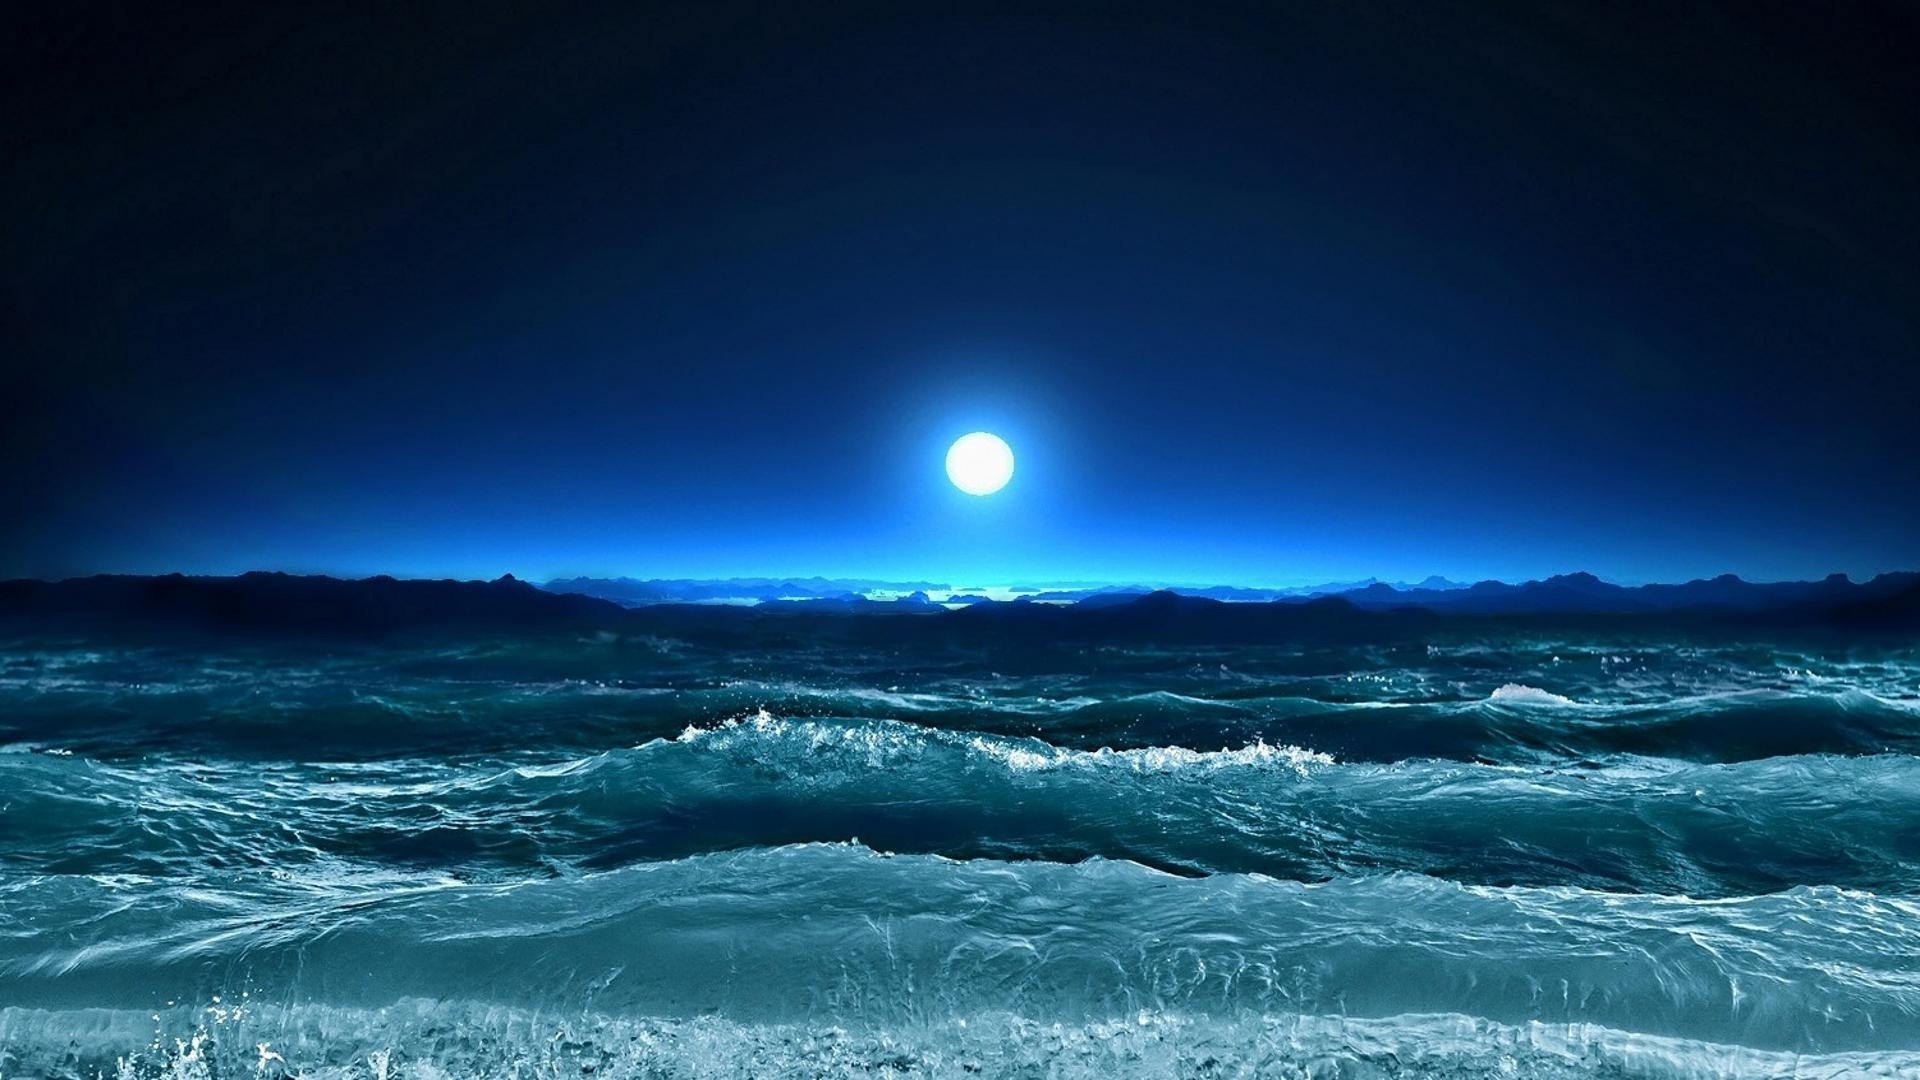 Ocean Waves wallpaper 253791 1920x1080